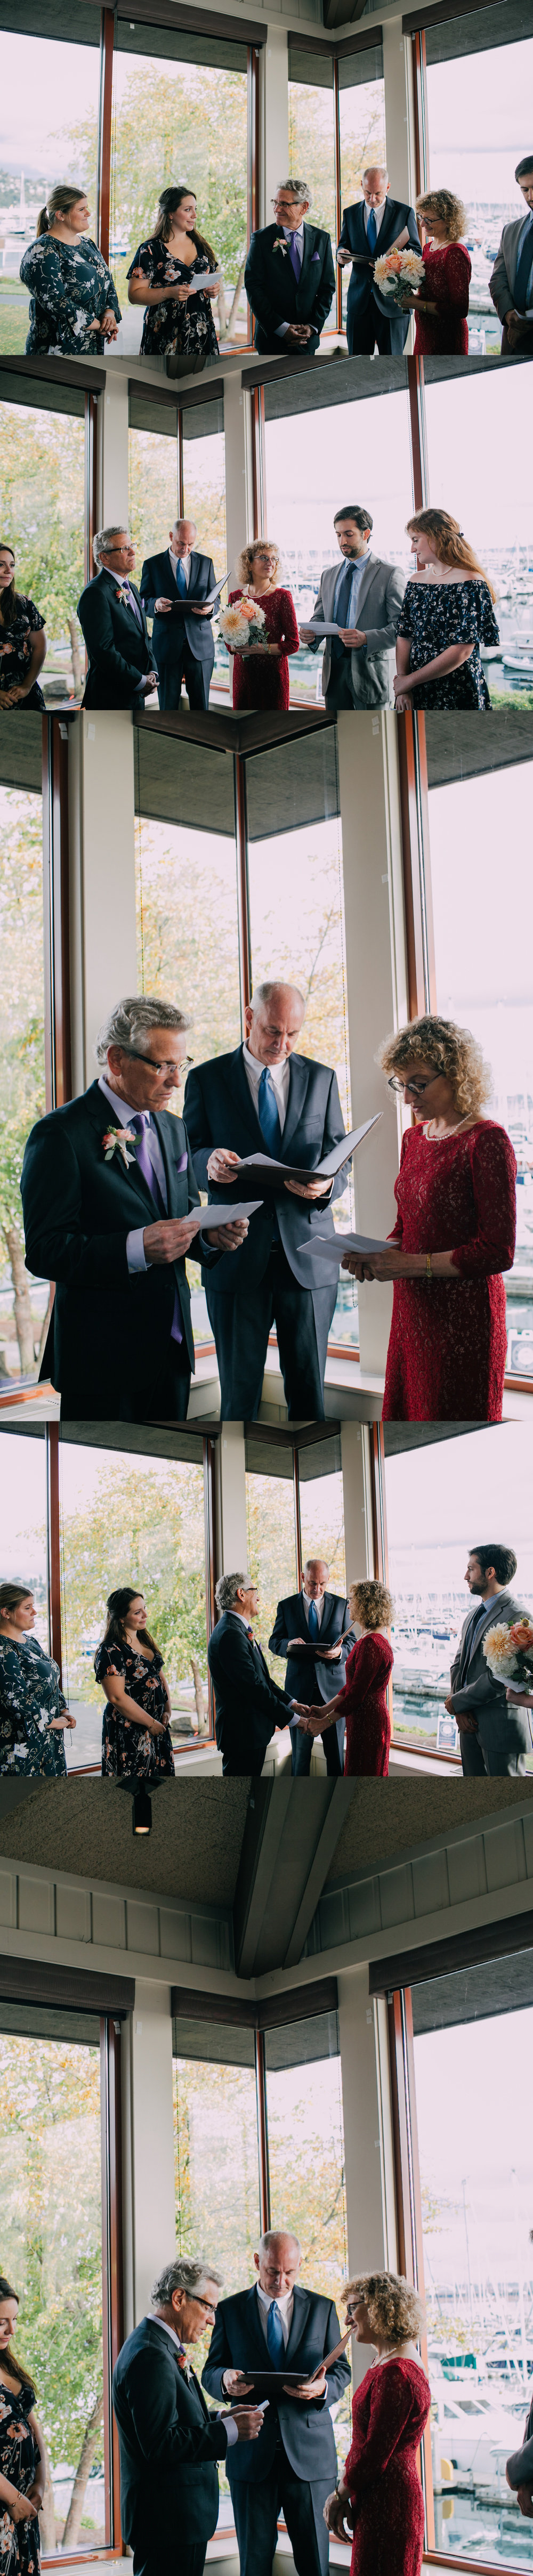 intimate small wedding photographer seattle washington pnw restaurant reception -4.jpg